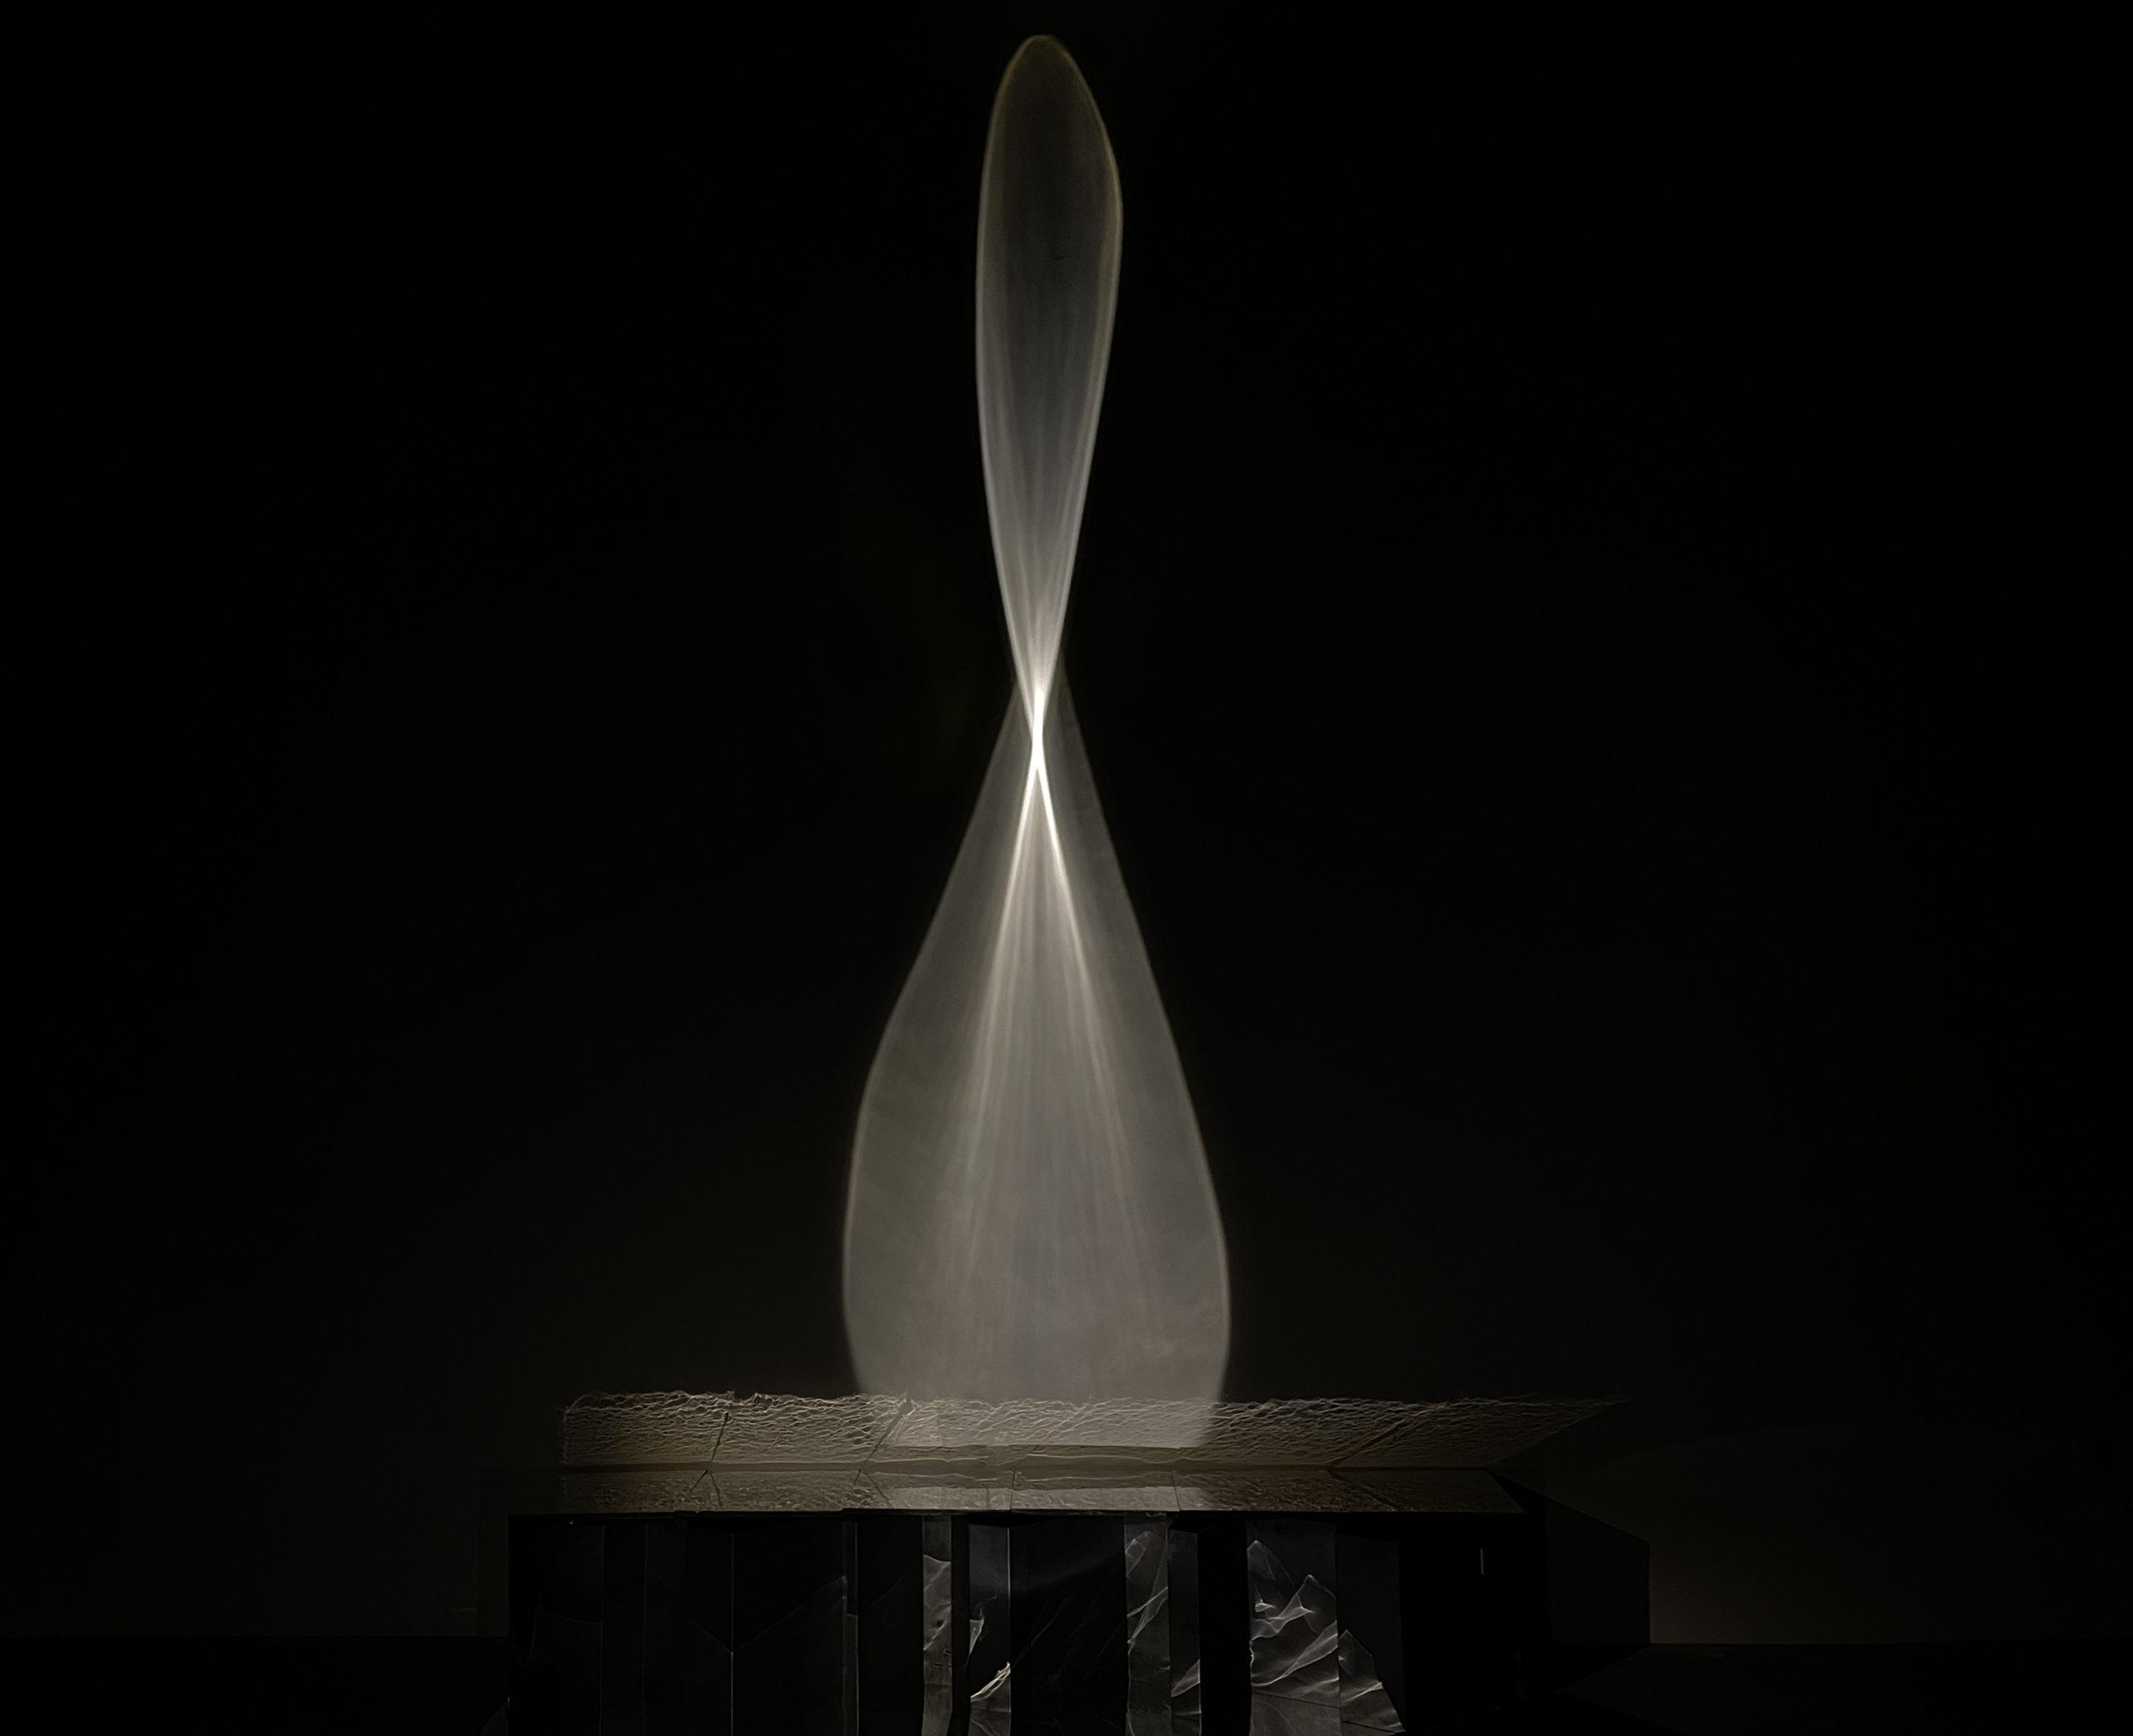 Nooshin Rostami, Zamân, 2020 Installation with sculptural elements and light